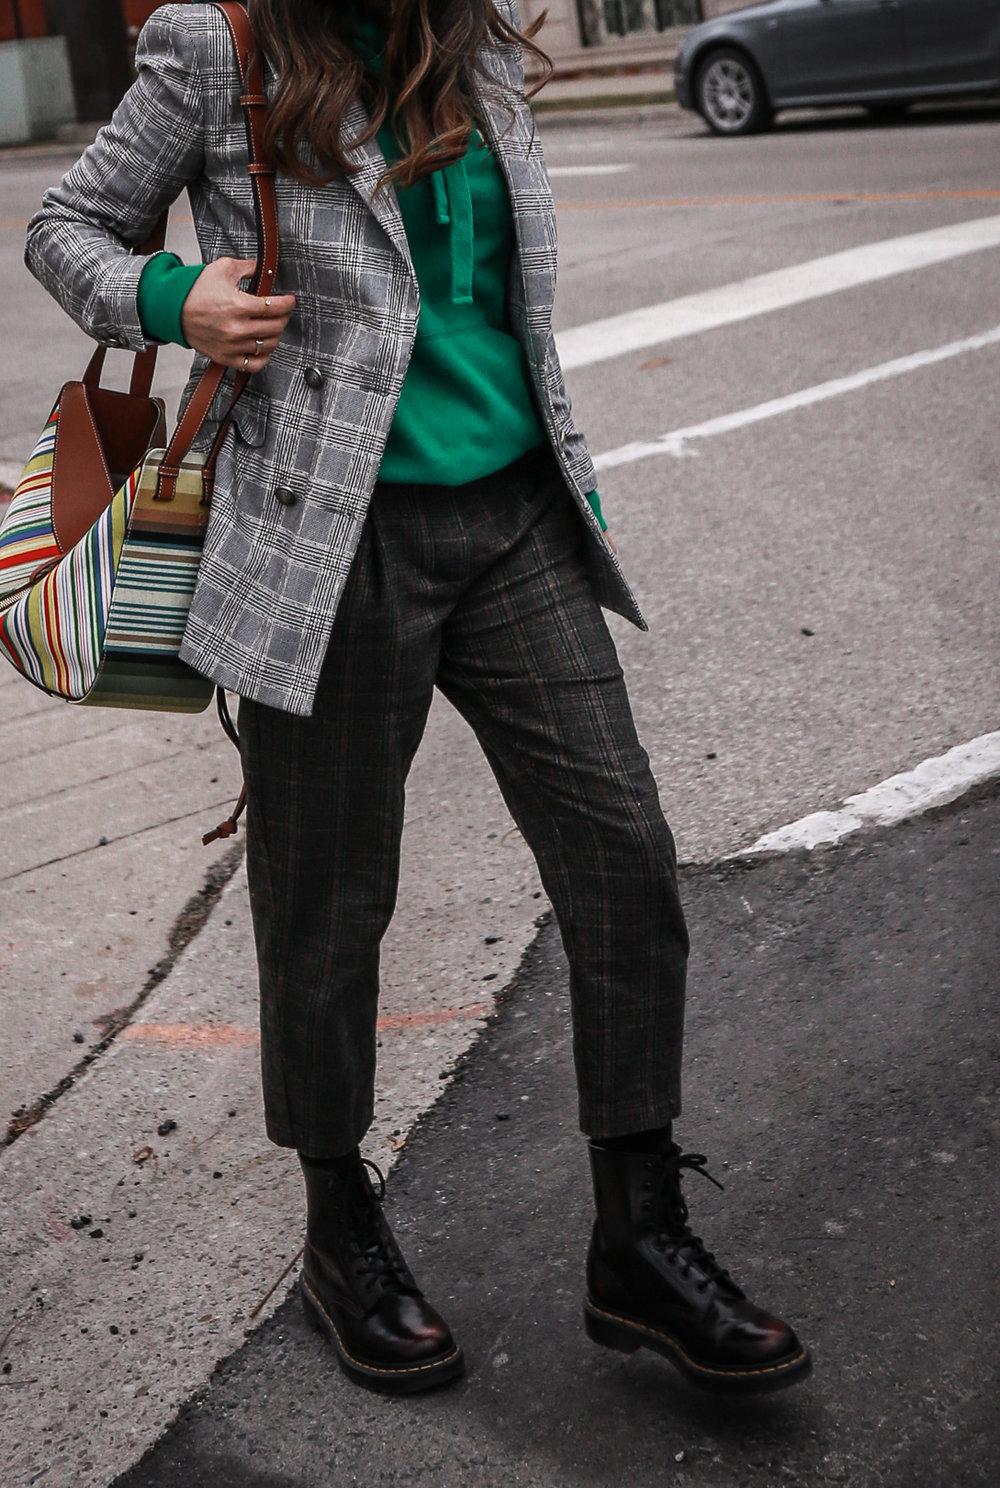 Nathalie Martin wearing plaid blazerk from Zara, green Isabel Marant hoodie, Aritzia wool Chambery pant, Doc Marten boots, striped Loewe hammock bag, Acne Studios ivory Pansy face beanie, woahstyle.com_4709.jpg